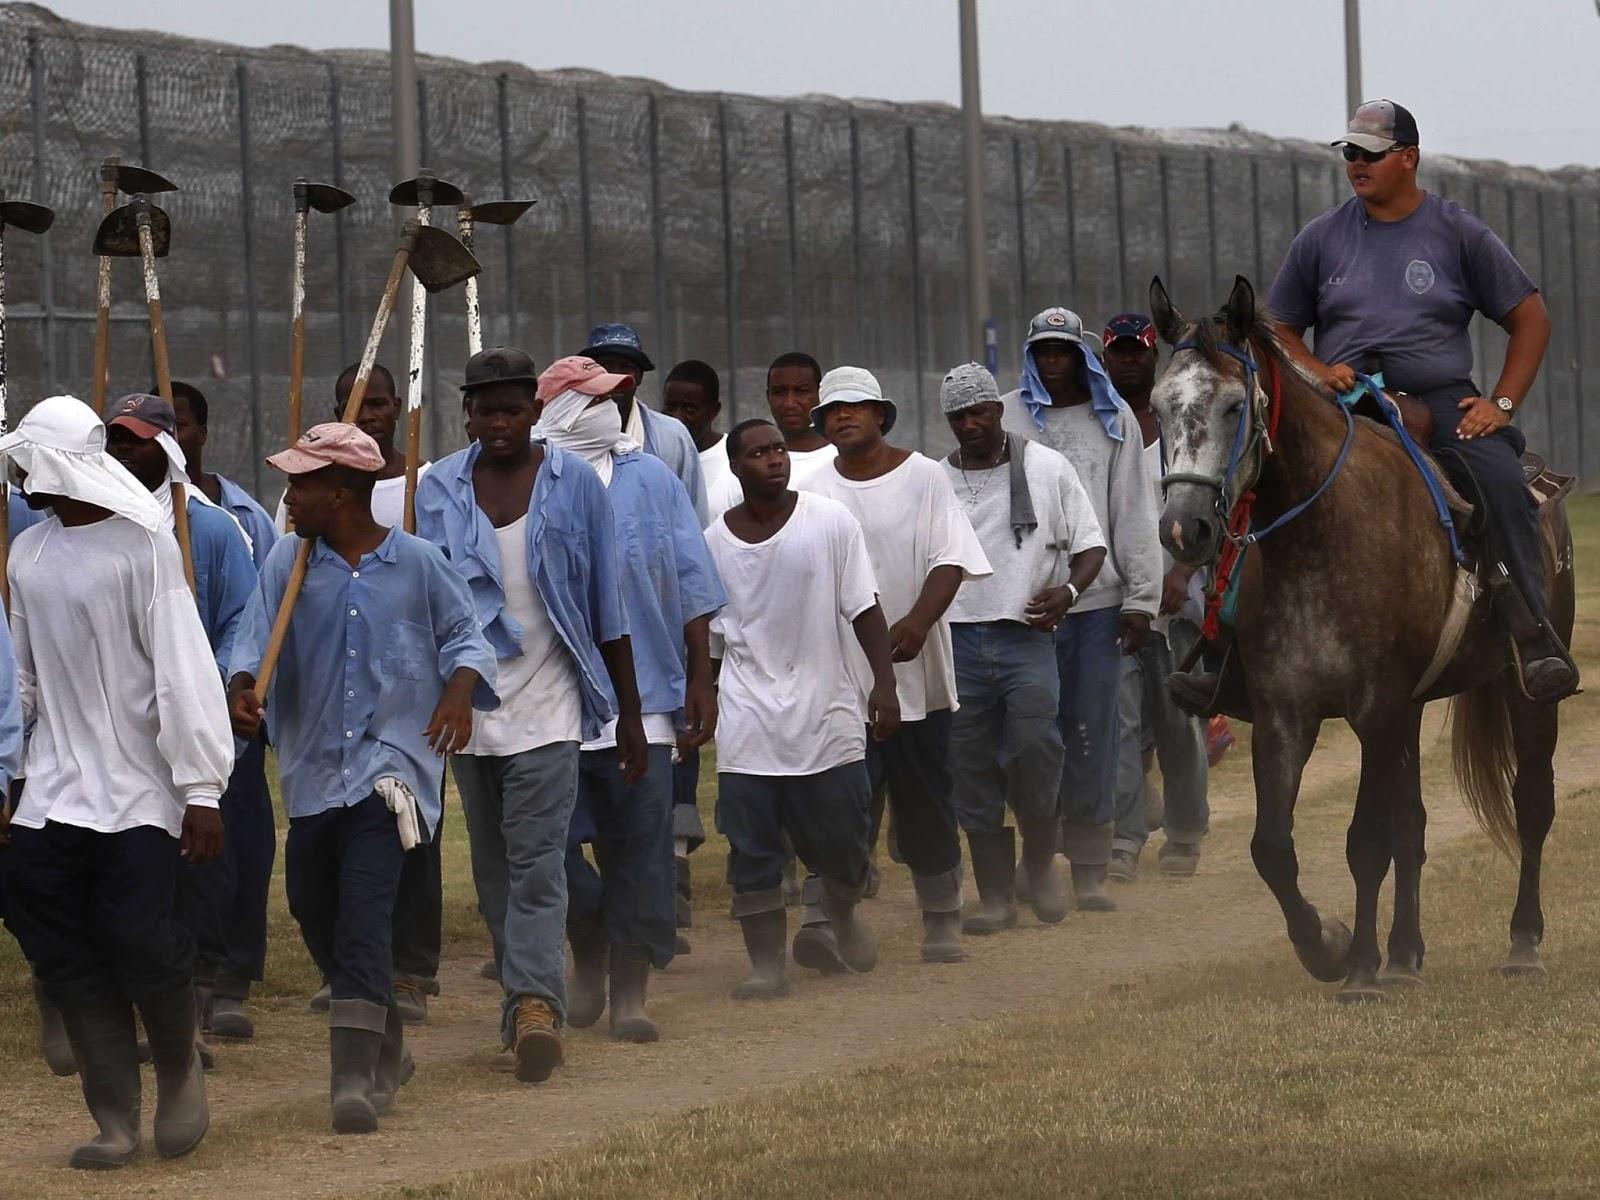 Angola Prison, Louisiana. Photo: Refractory